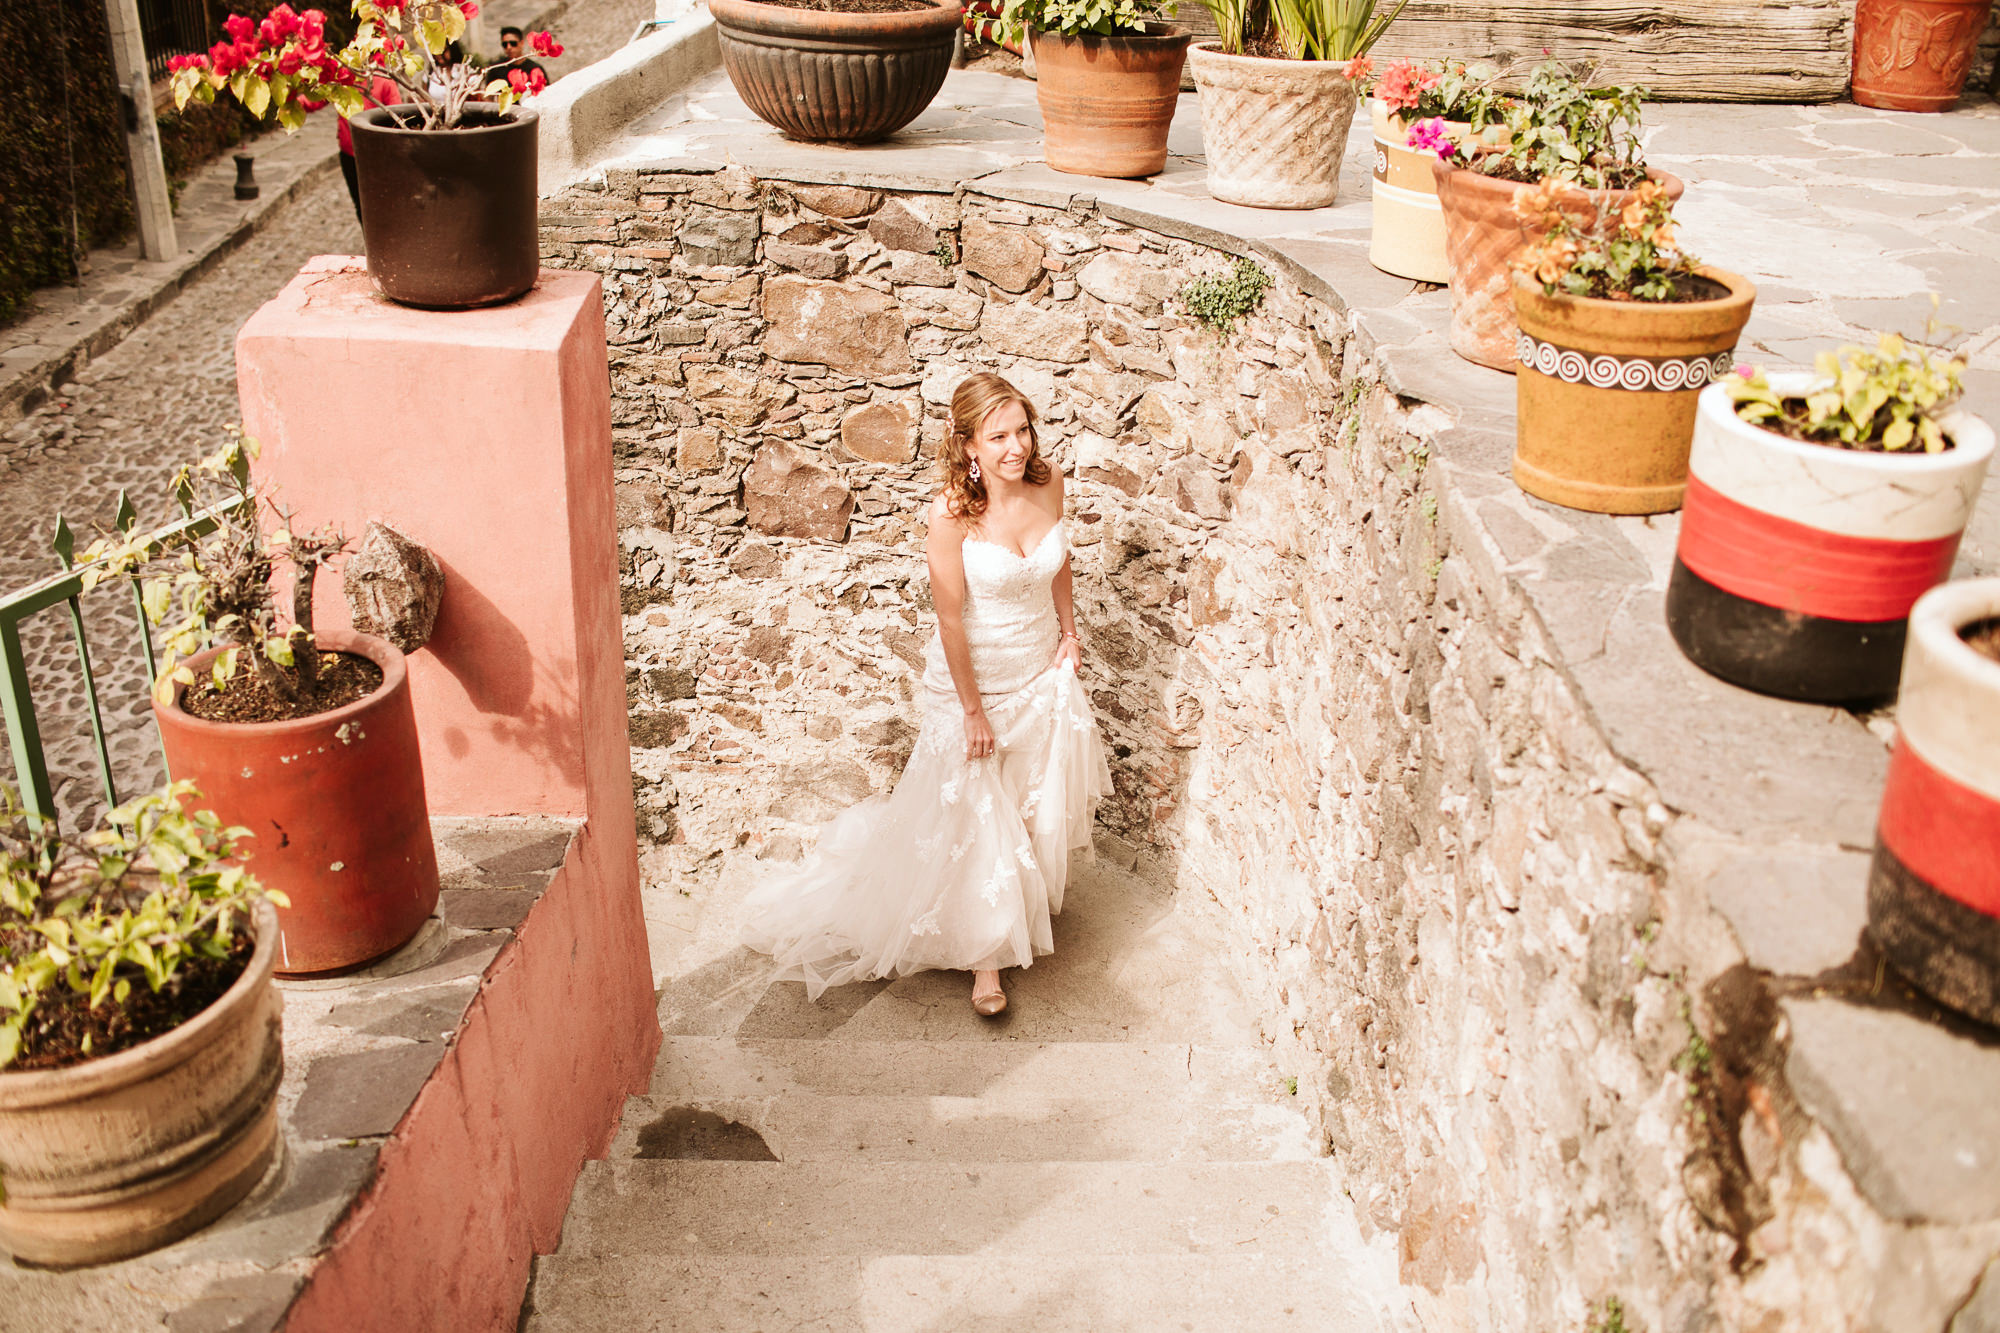 Destination-wedding-photographer-62.jpg